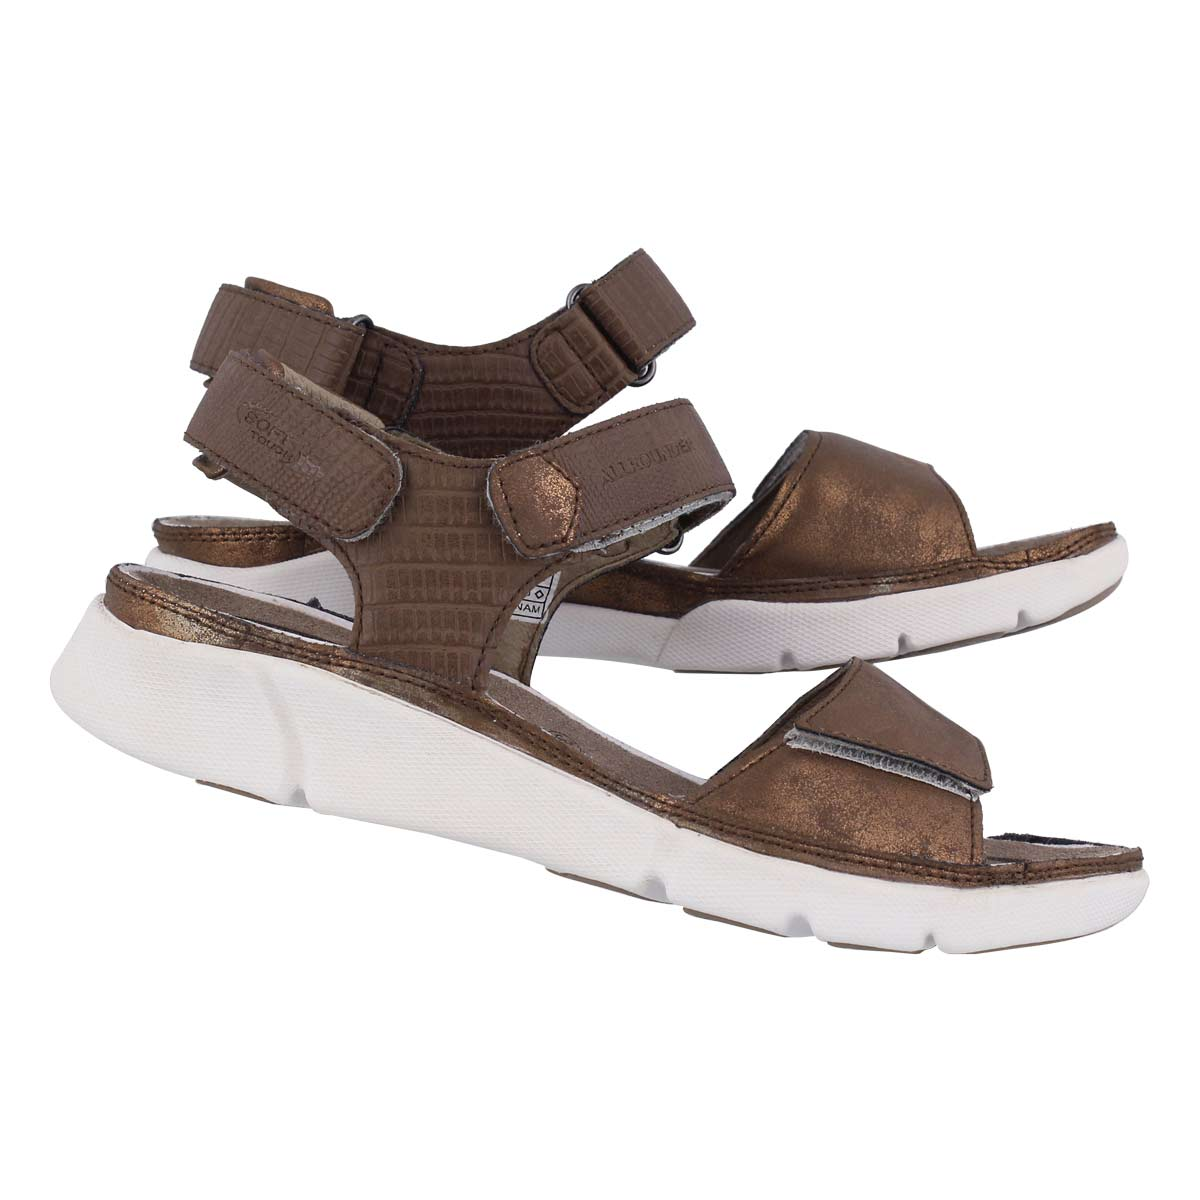 Lds Tabasa bronze casual sandal